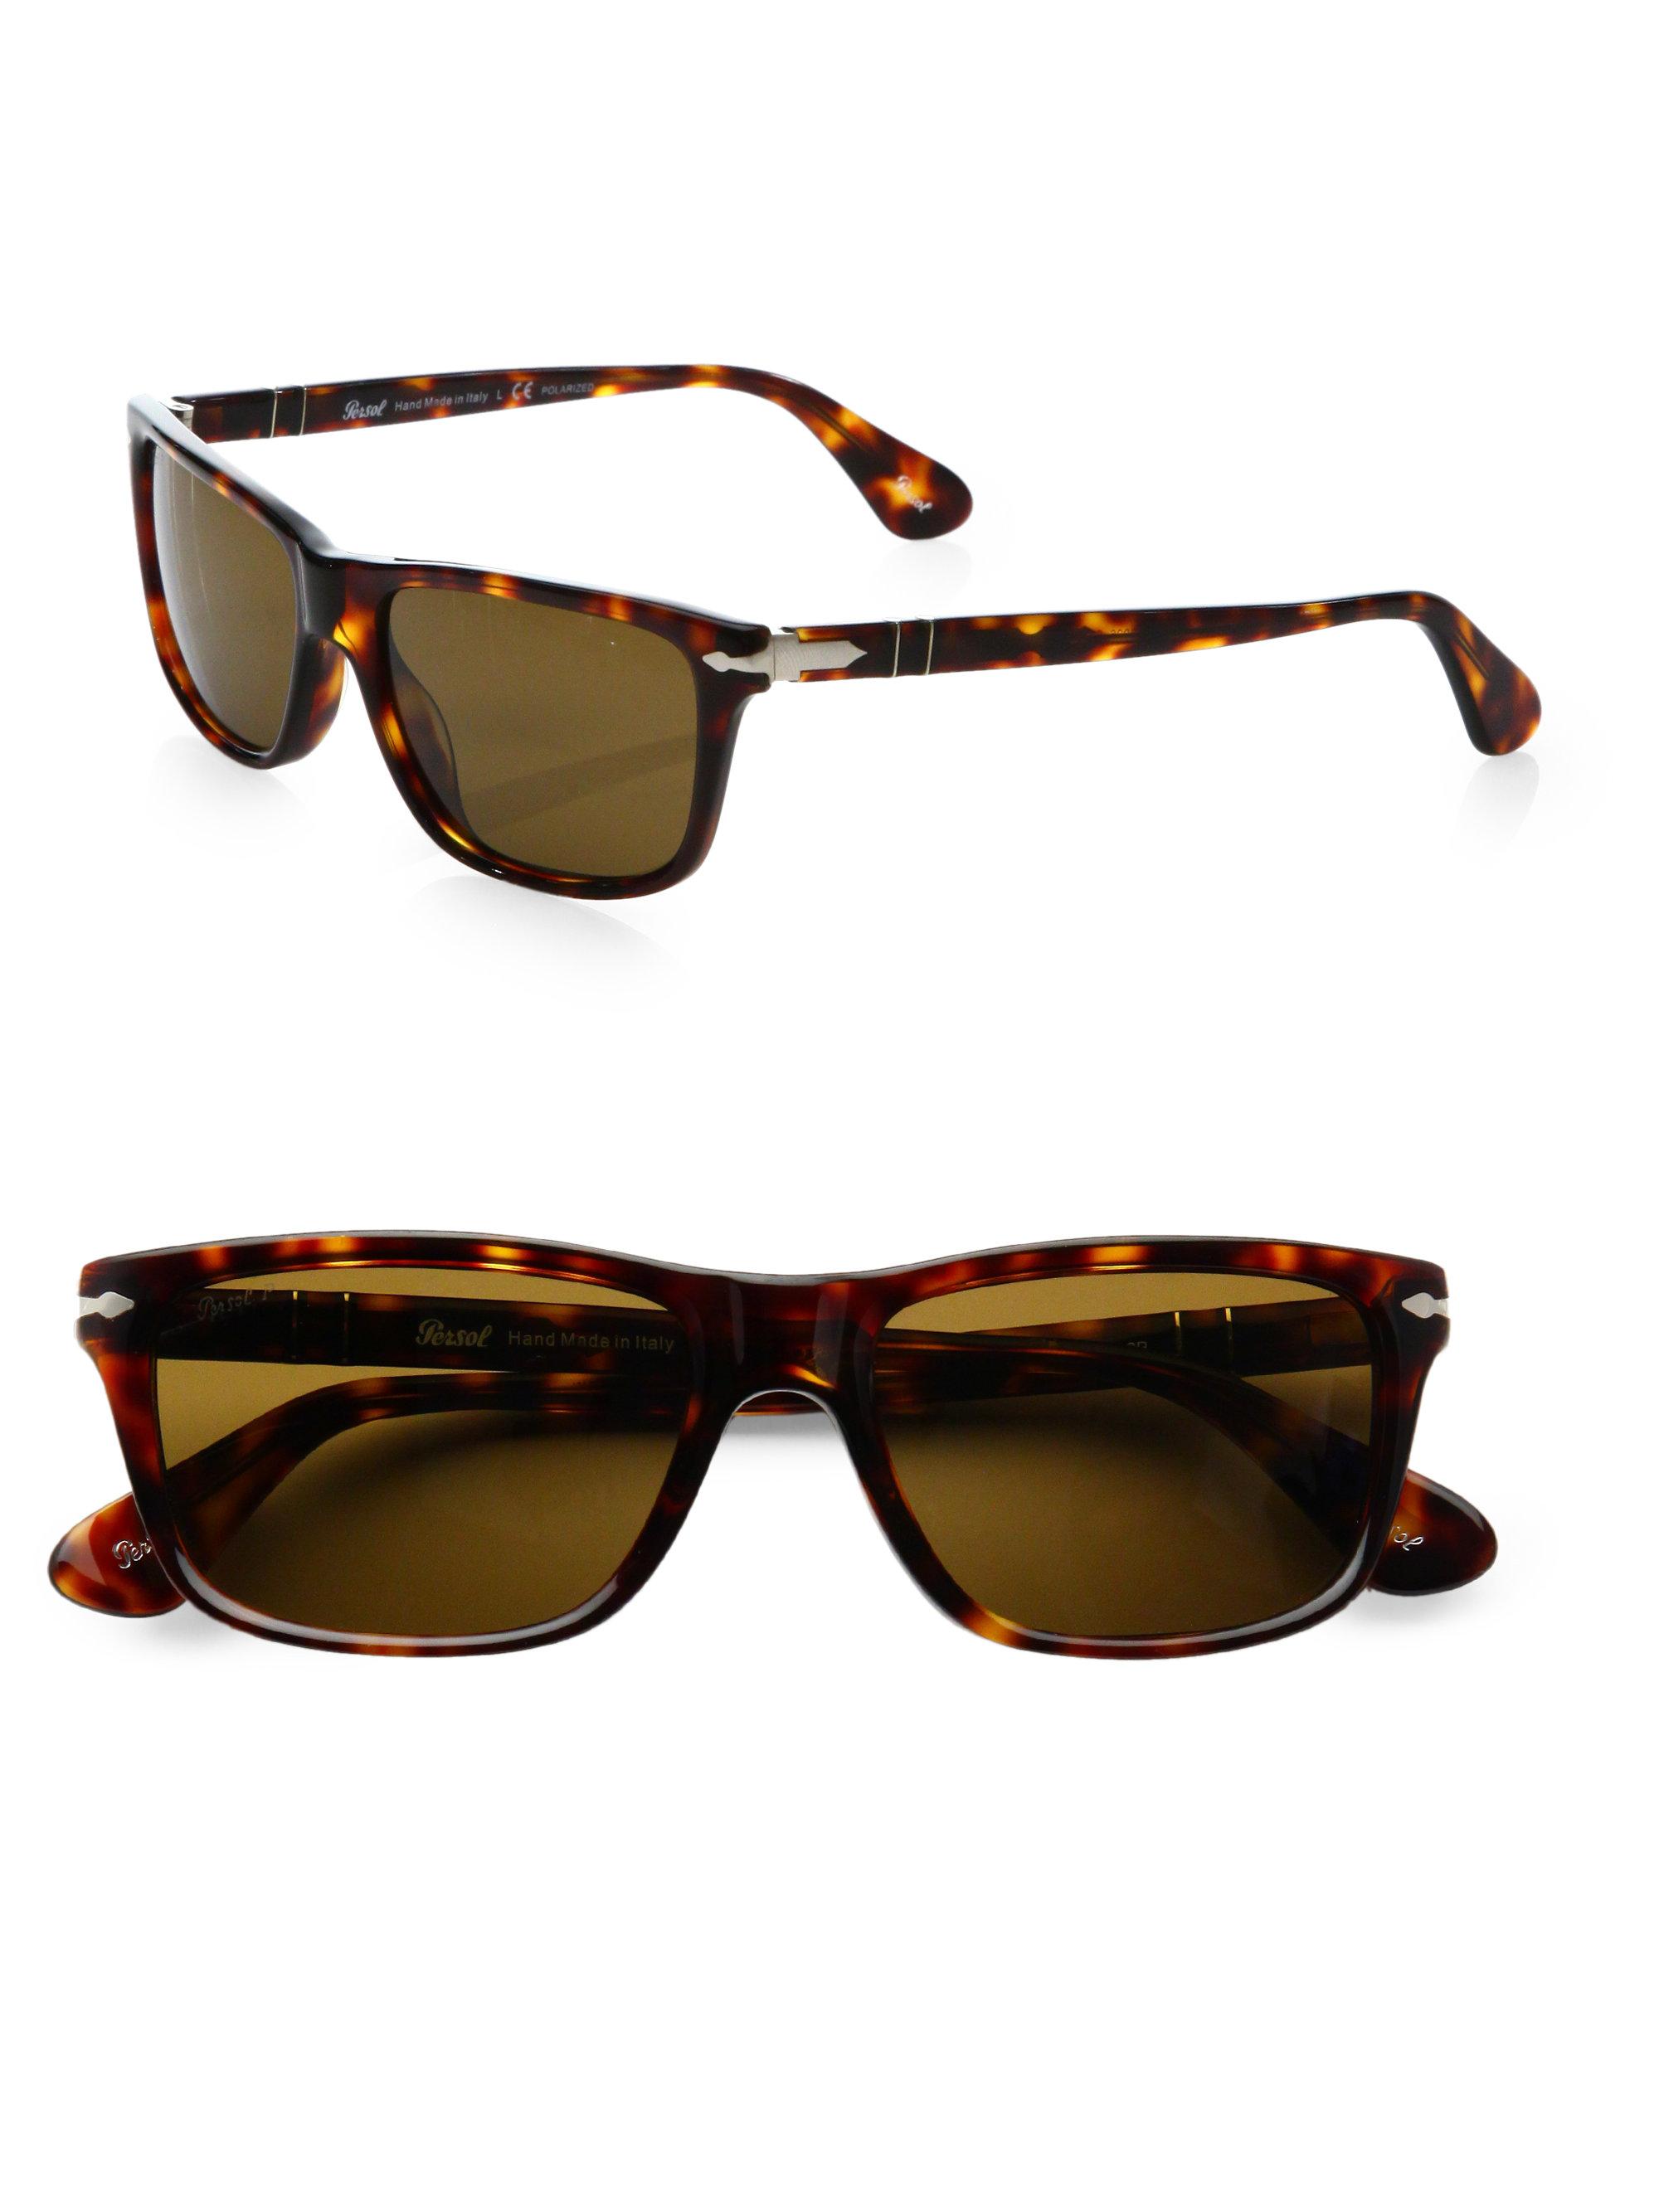 Acetate Brown For Persol In Rectangular Sunglasses Men Lyst qUMVpjLSGz